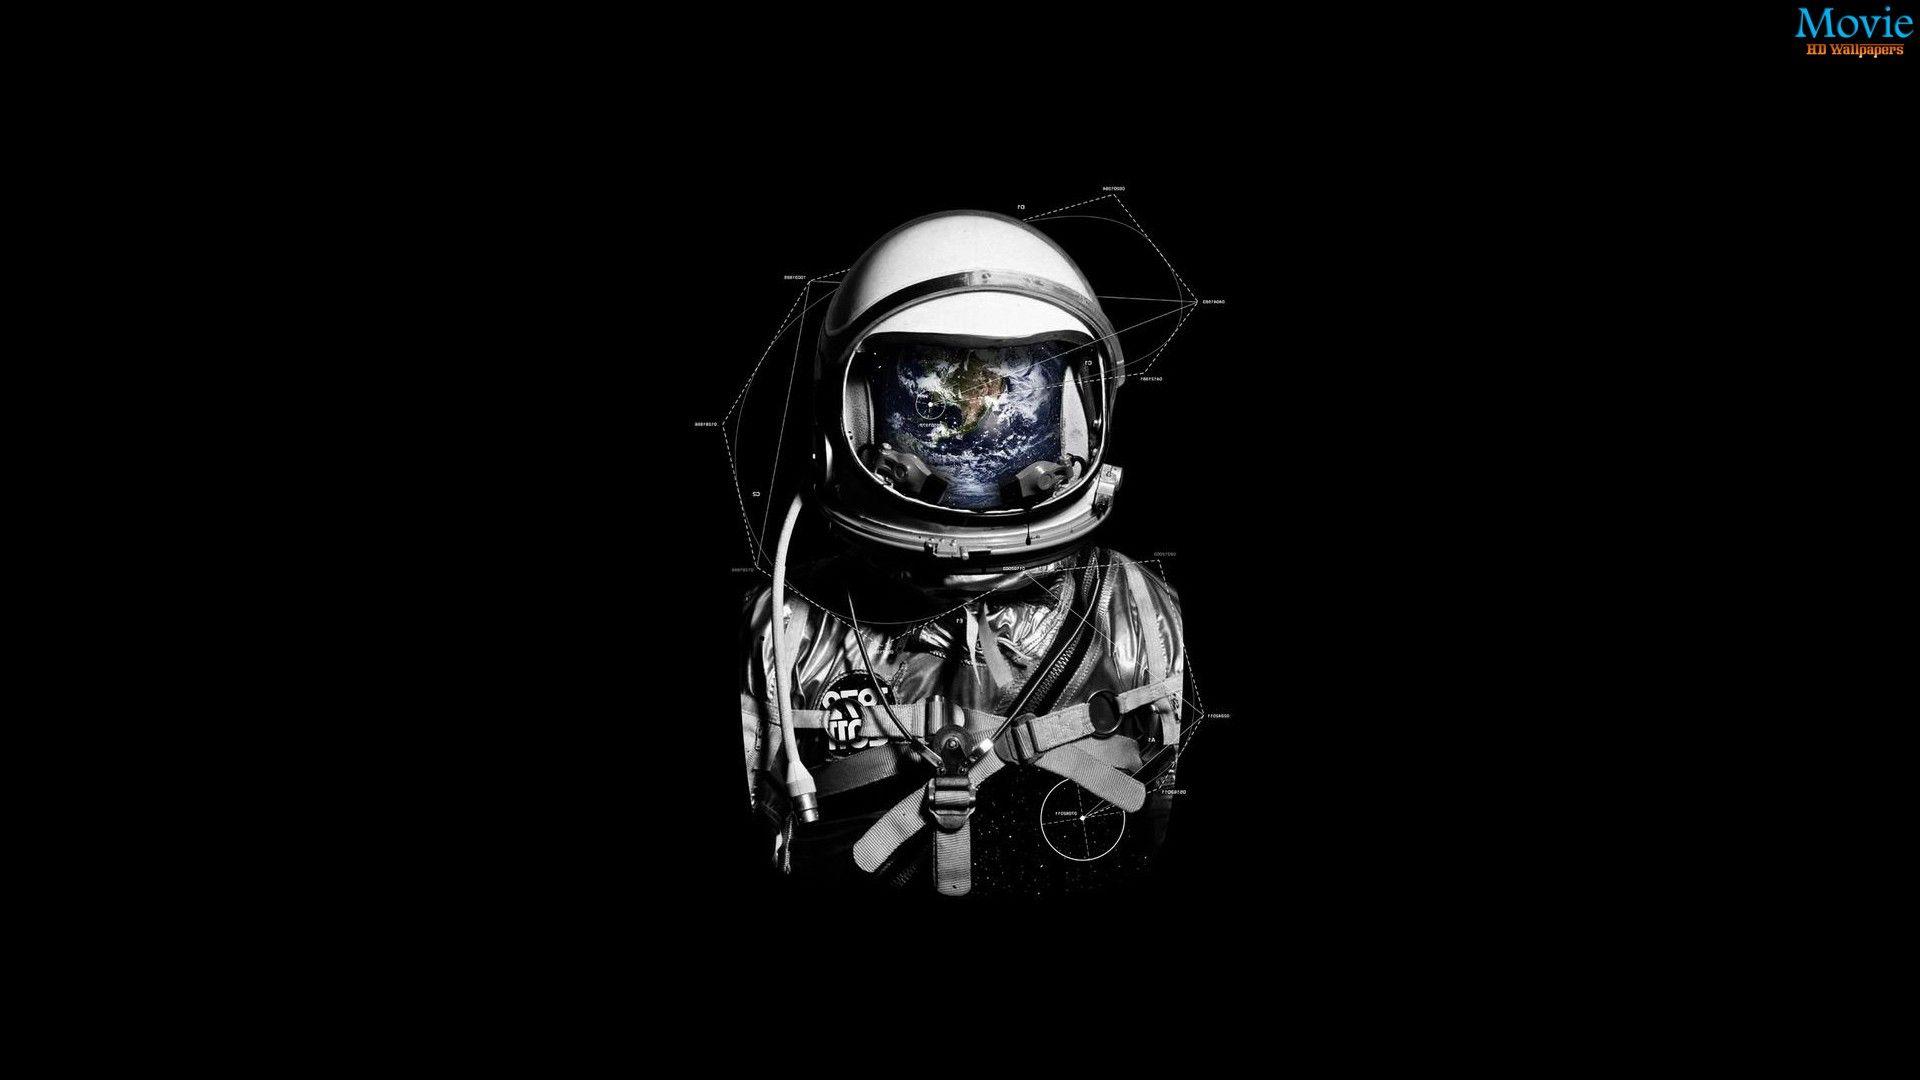 Interstellar Download Free Wallpaper 1 Jpg 1 9 1 080ピクセル Pc 壁紙 シンプル 宇宙服 どんより